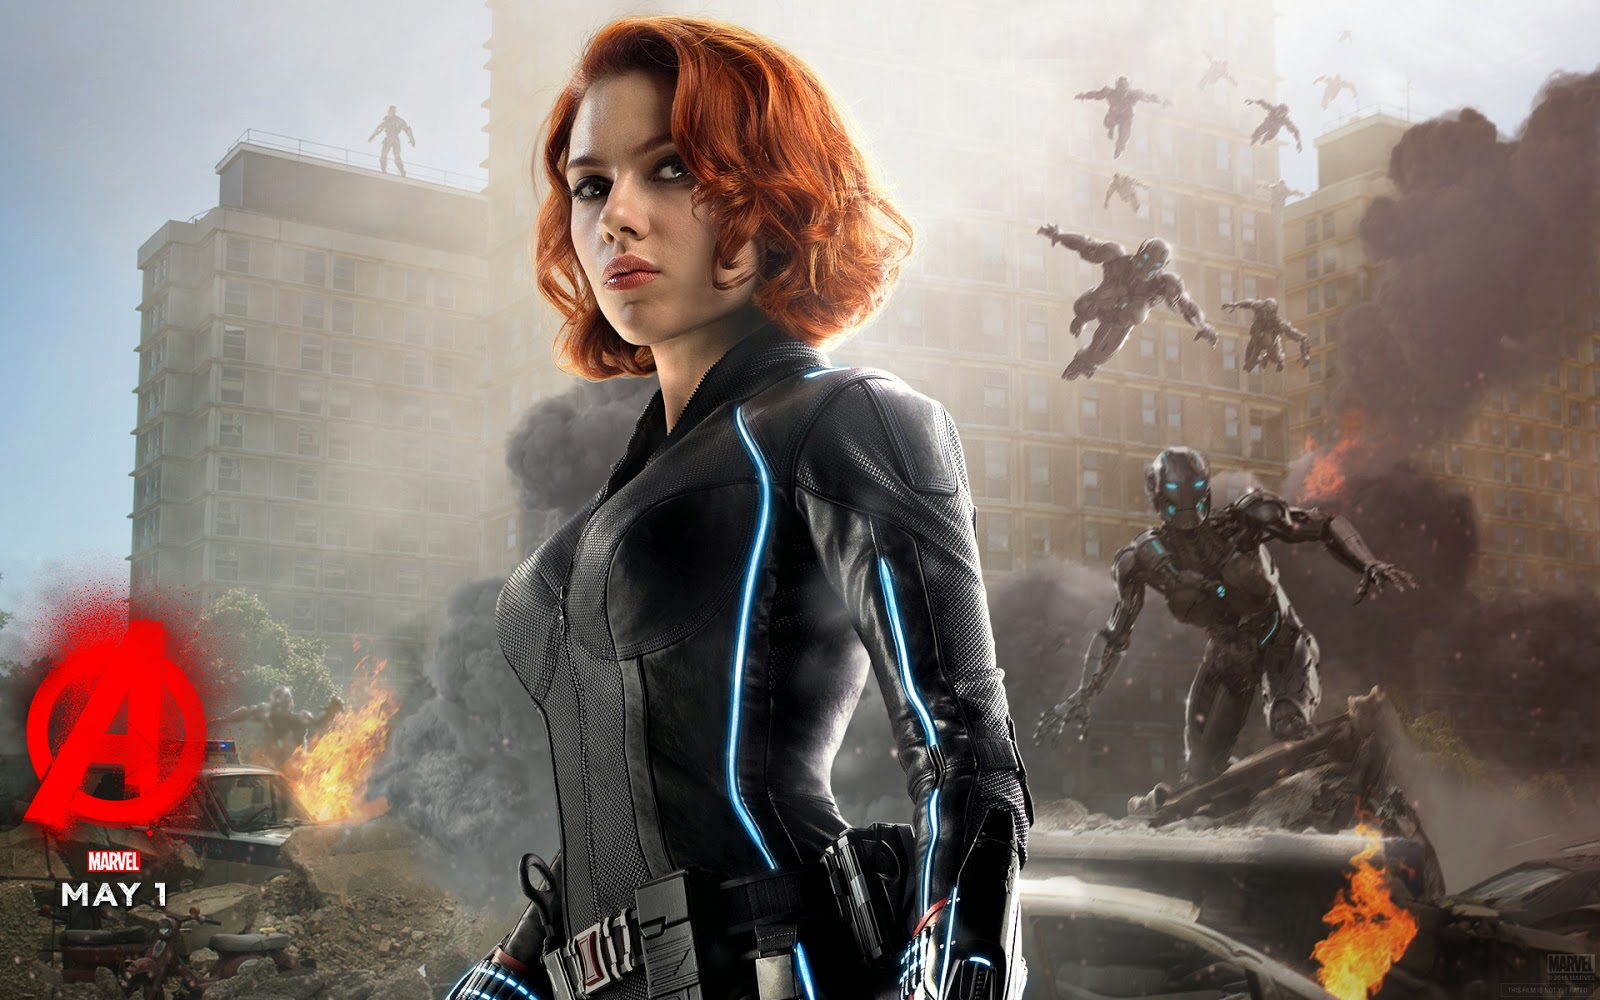 Amazing Wallpaper Marvel Avengers Age Ultron - Black%2BWidow%2BAvengers%2BAge%2Bof%2BUltron%2B2015%2BWallpaper  You Should Have_85665.jpg